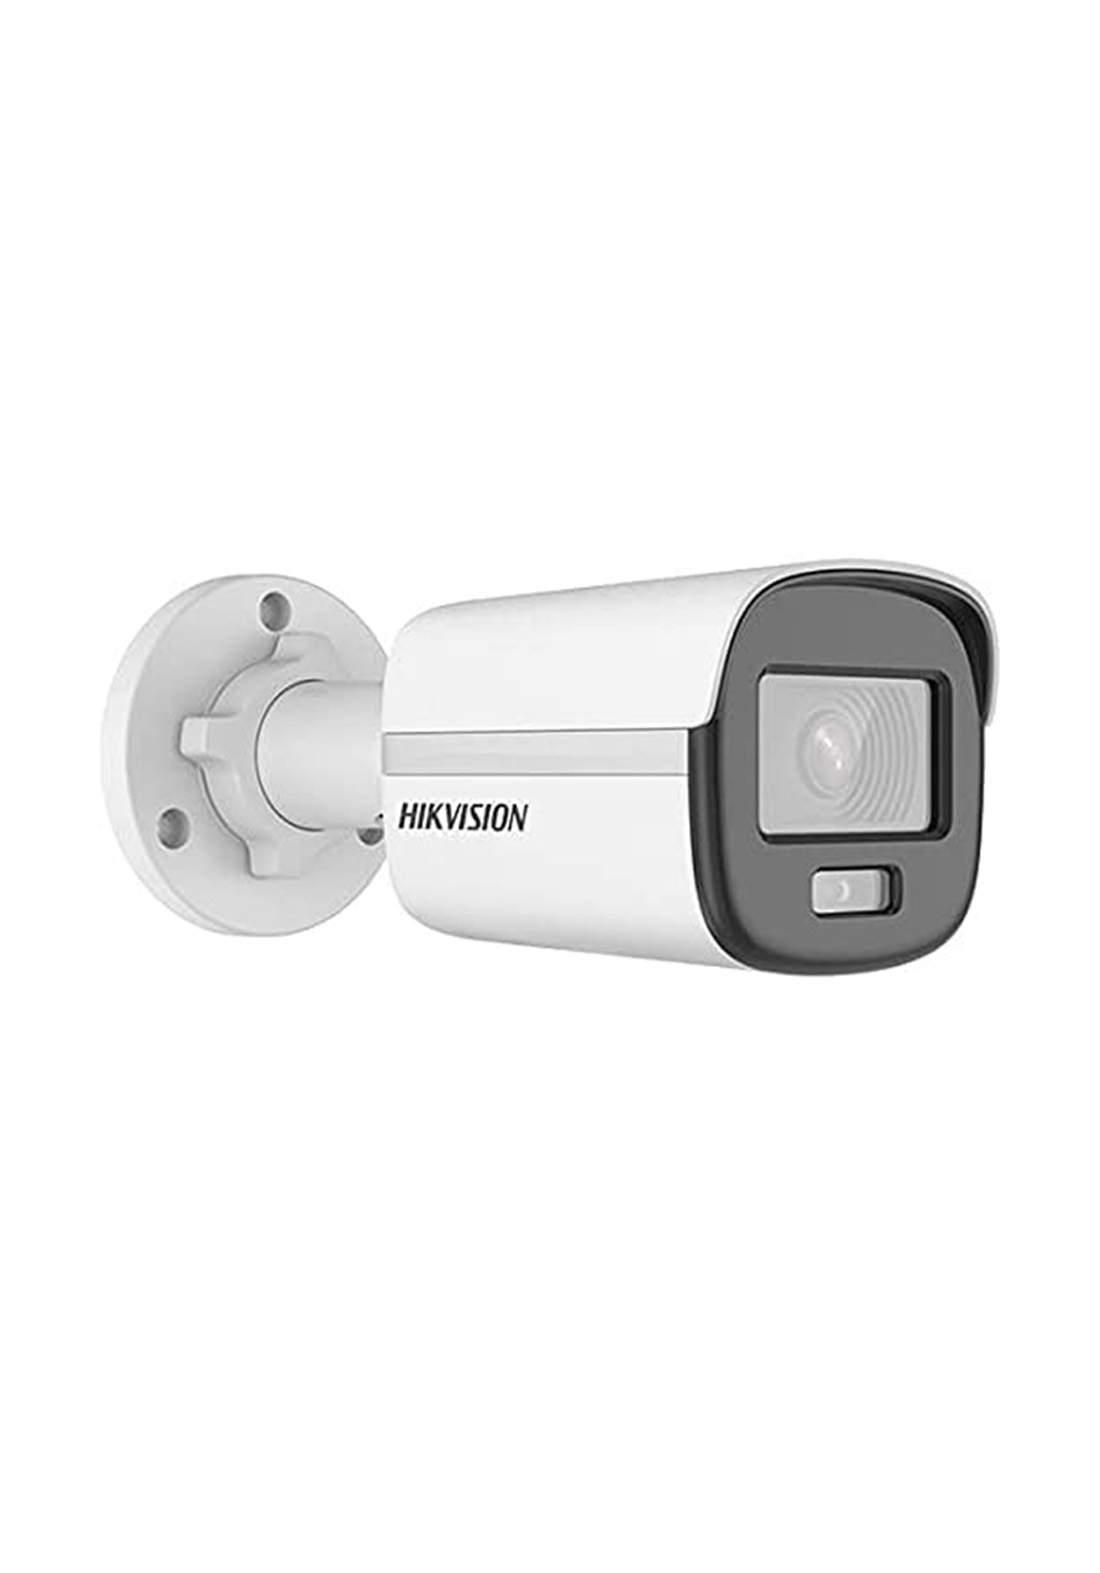 Hikvision DS-2CD1027G0-L ColorVu Lite Fixed Bullet Network Camera 2.8mm Lens - White  كاميرا مراقبة